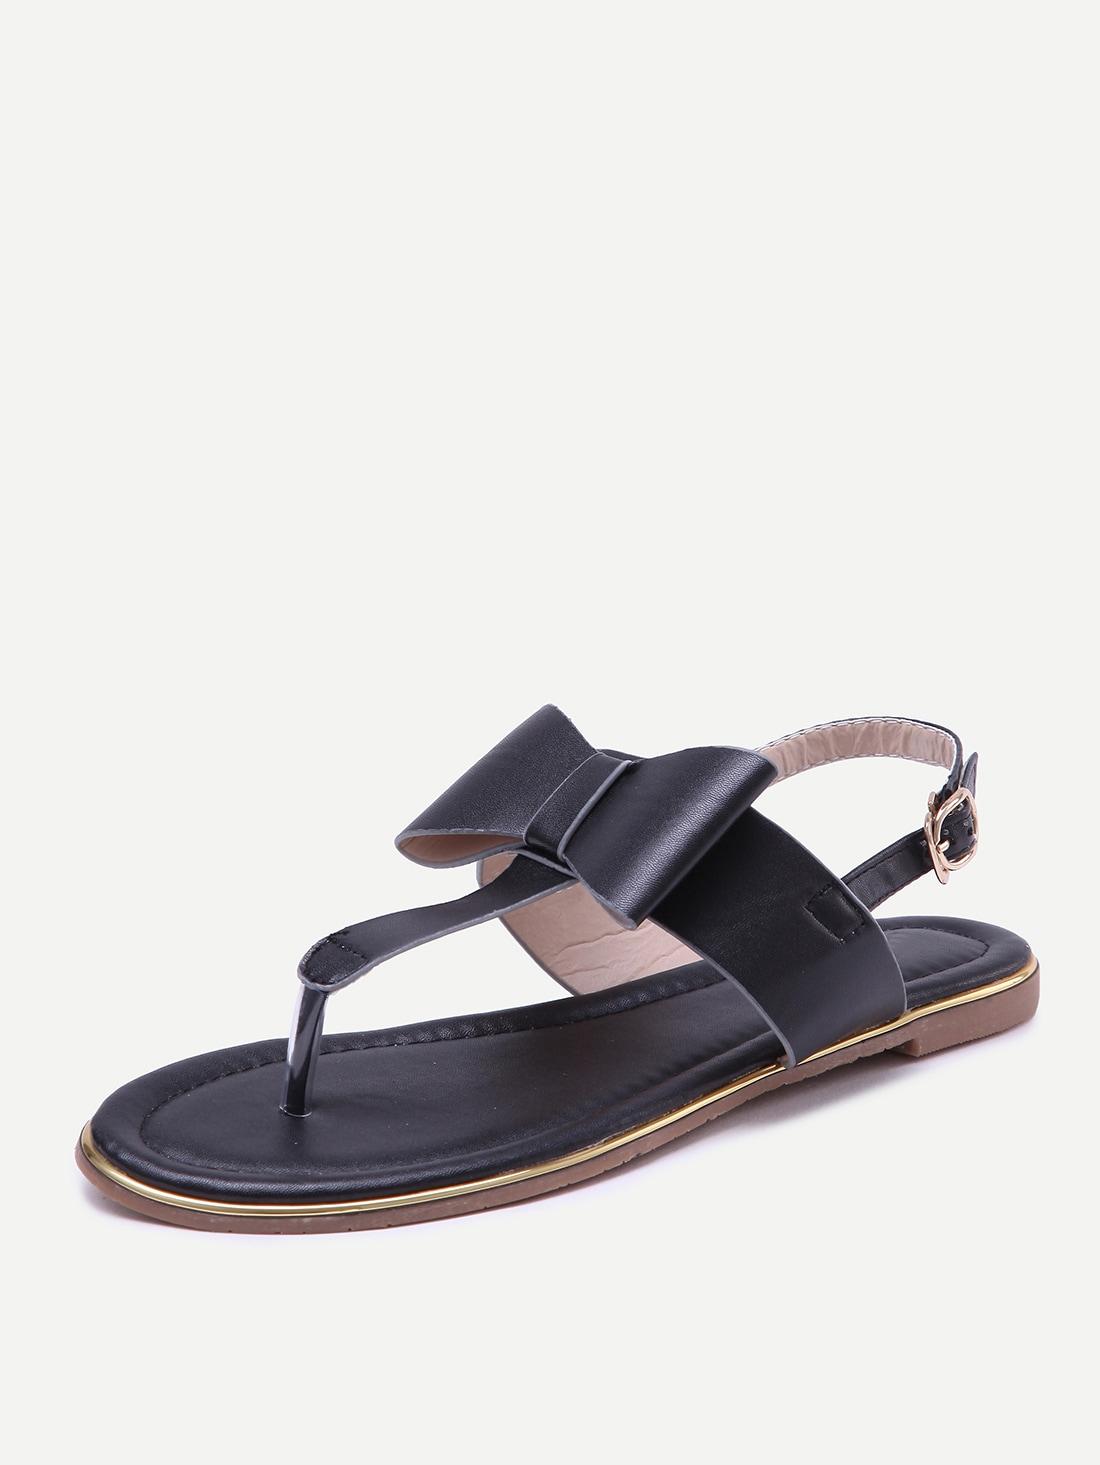 bow tie sandals photo - 1